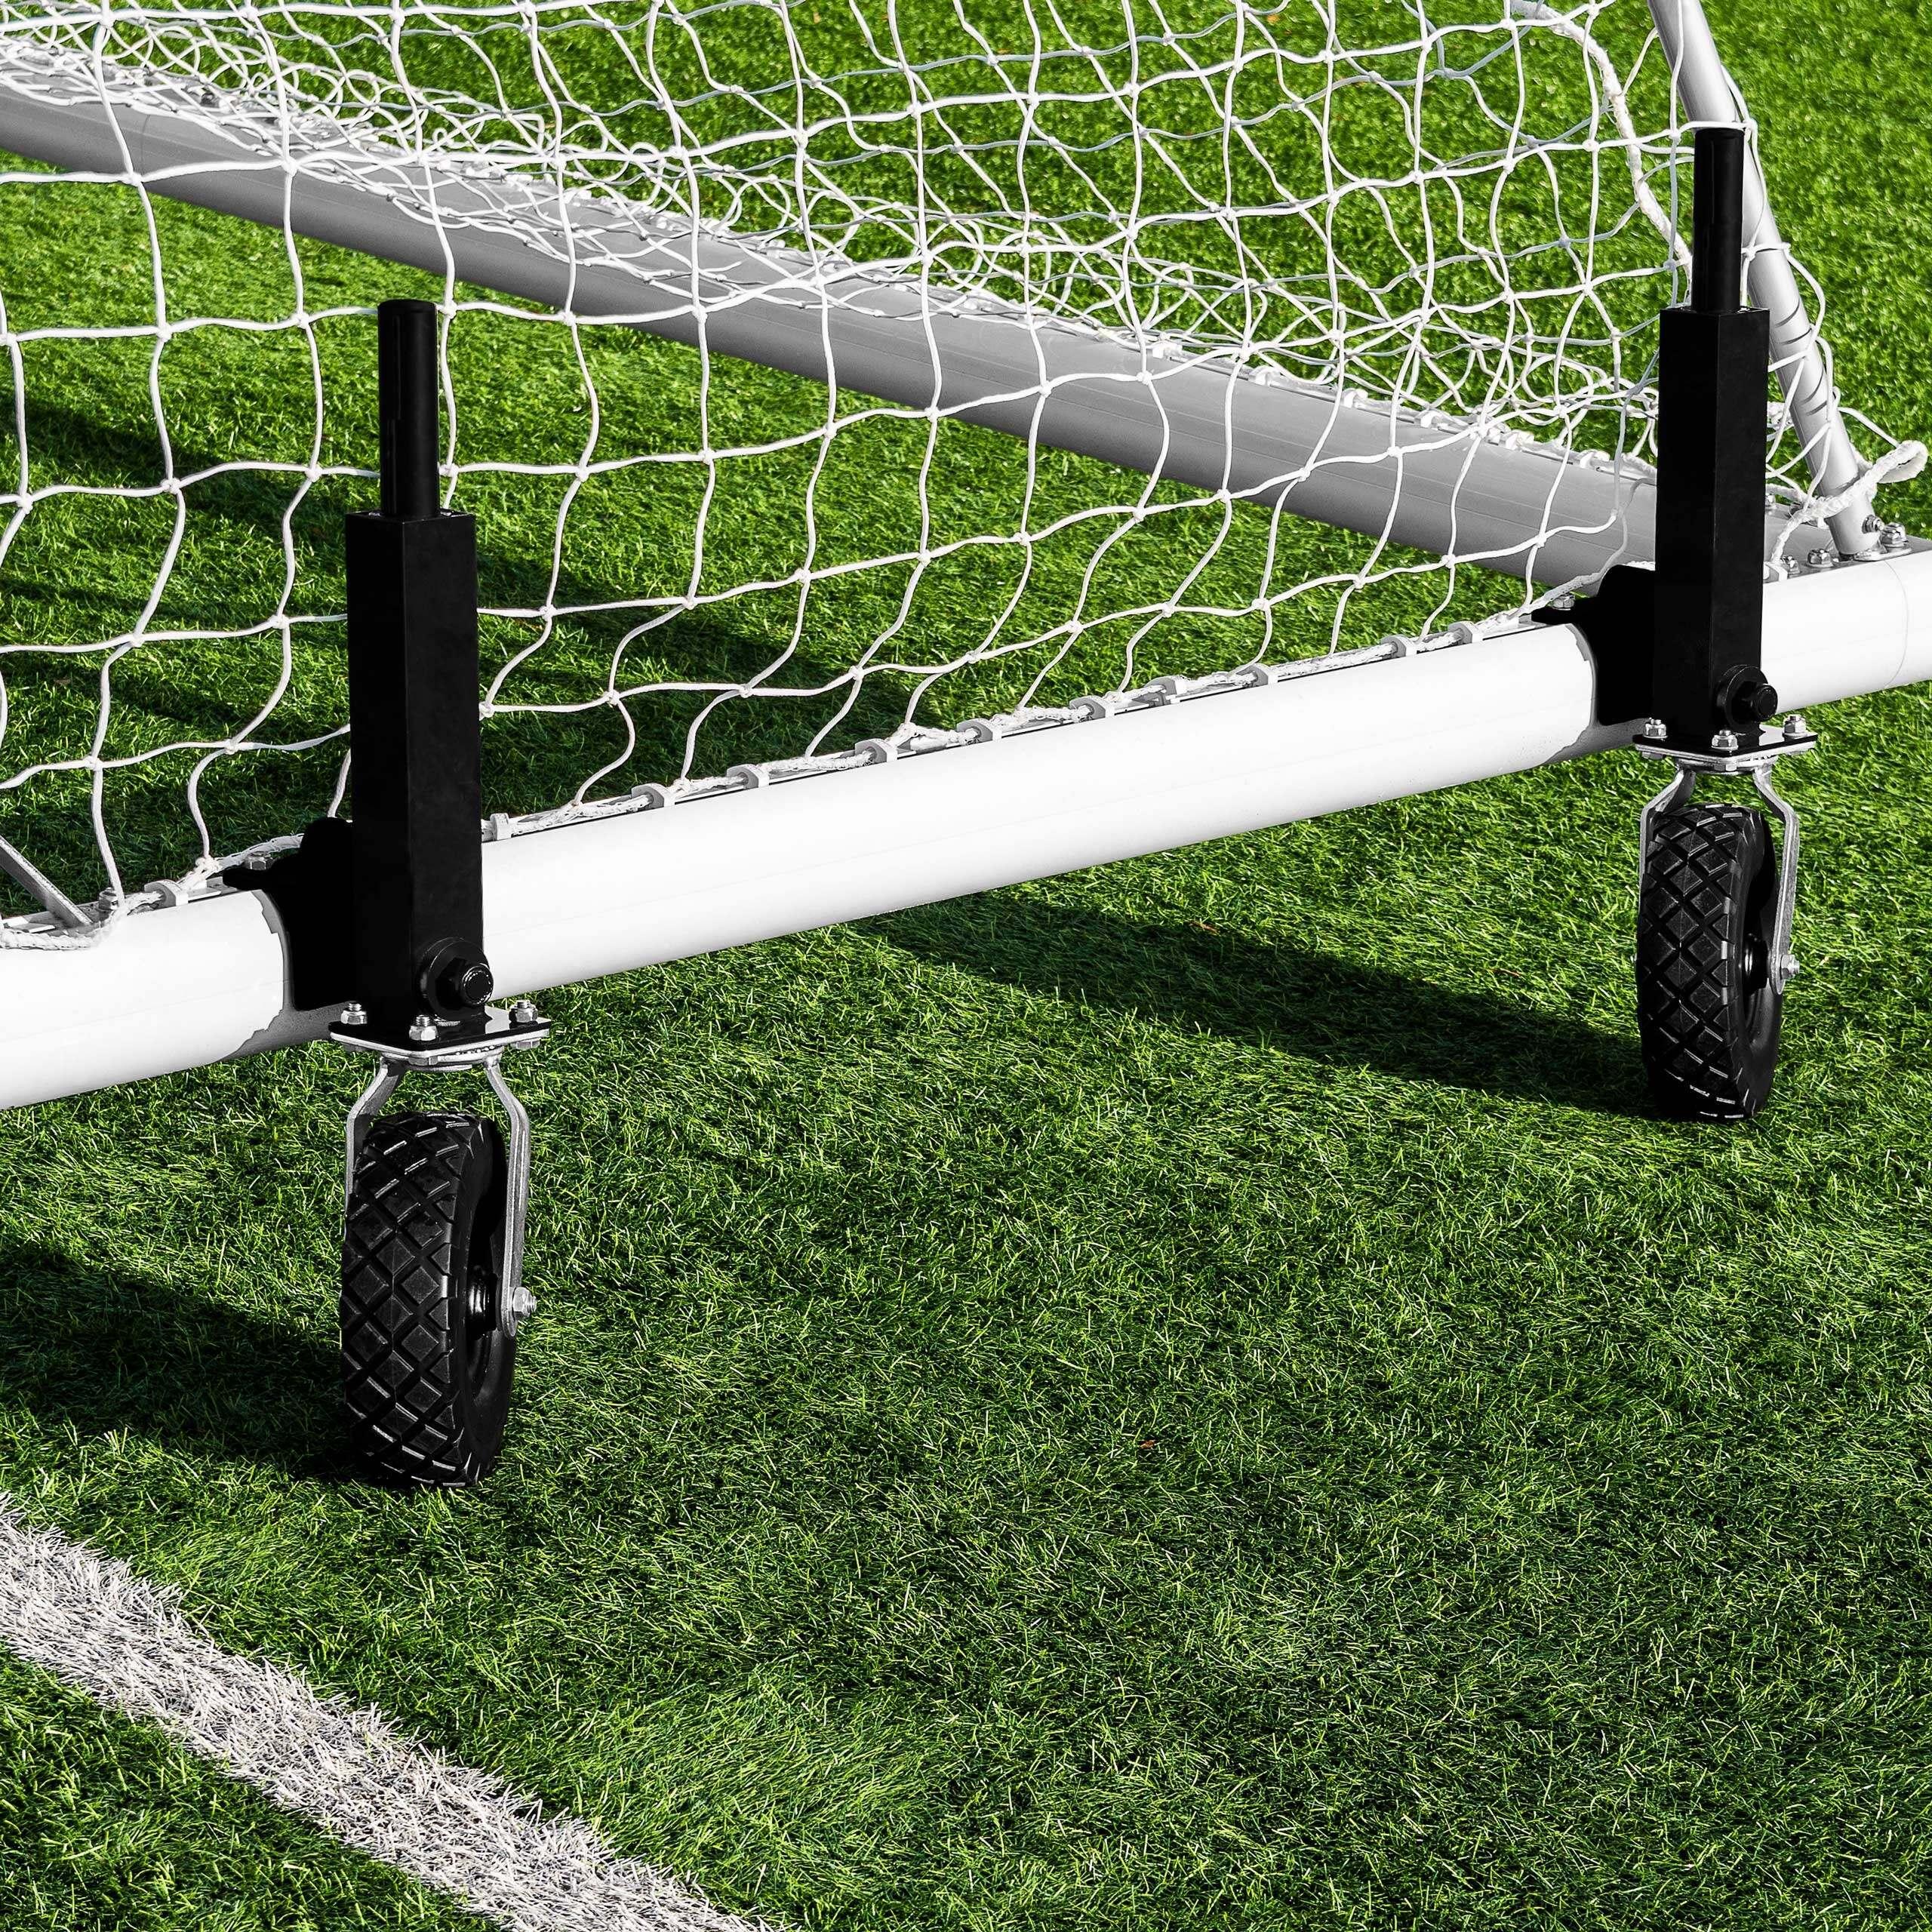 FORZA Alu110 Football Goal Wheels (Lever And 360° Wheels) - Set Of 8 360° Wheels